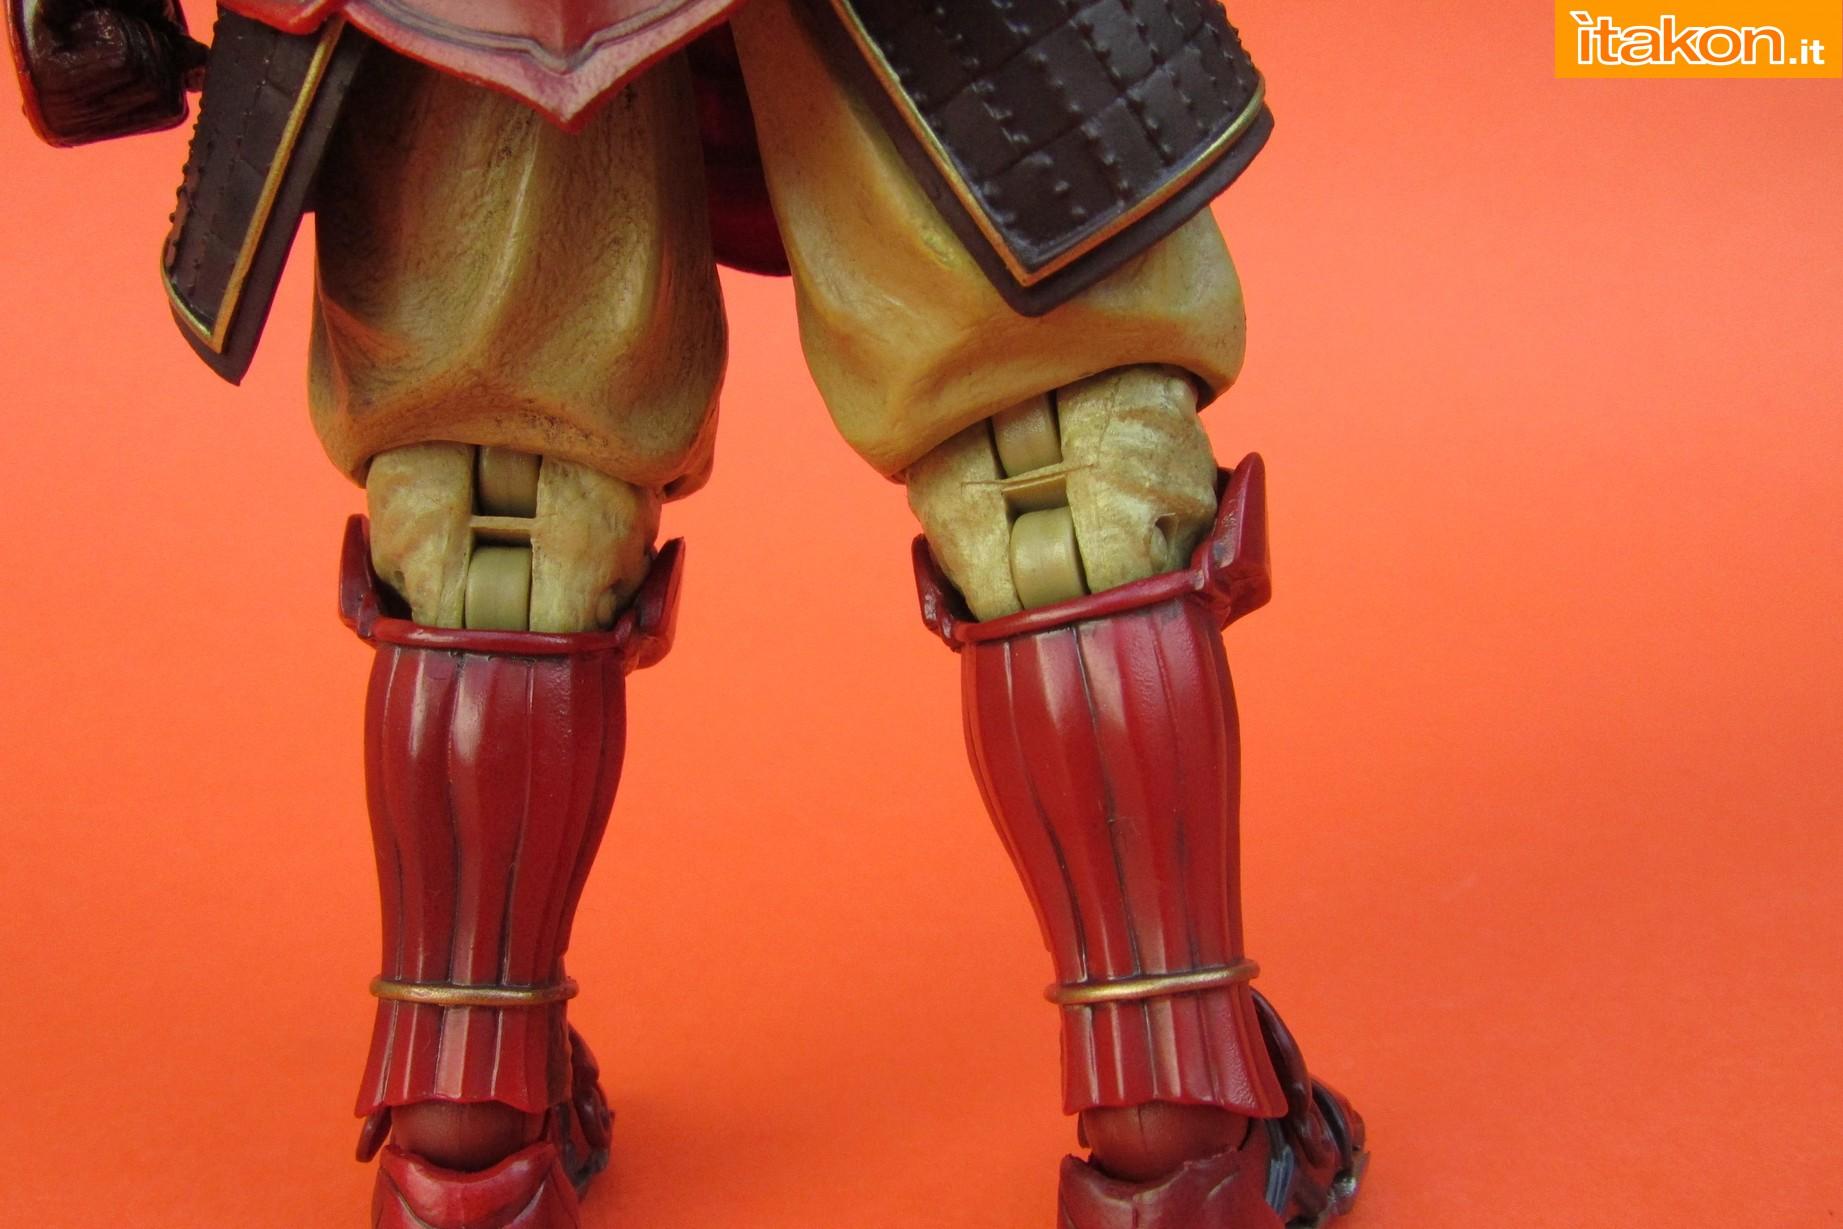 Link a Marvel Comics Koutetsu Samurai Iron Man Mark 3 Meishou MANGA REALIZATION review Bandai Itakon.it23